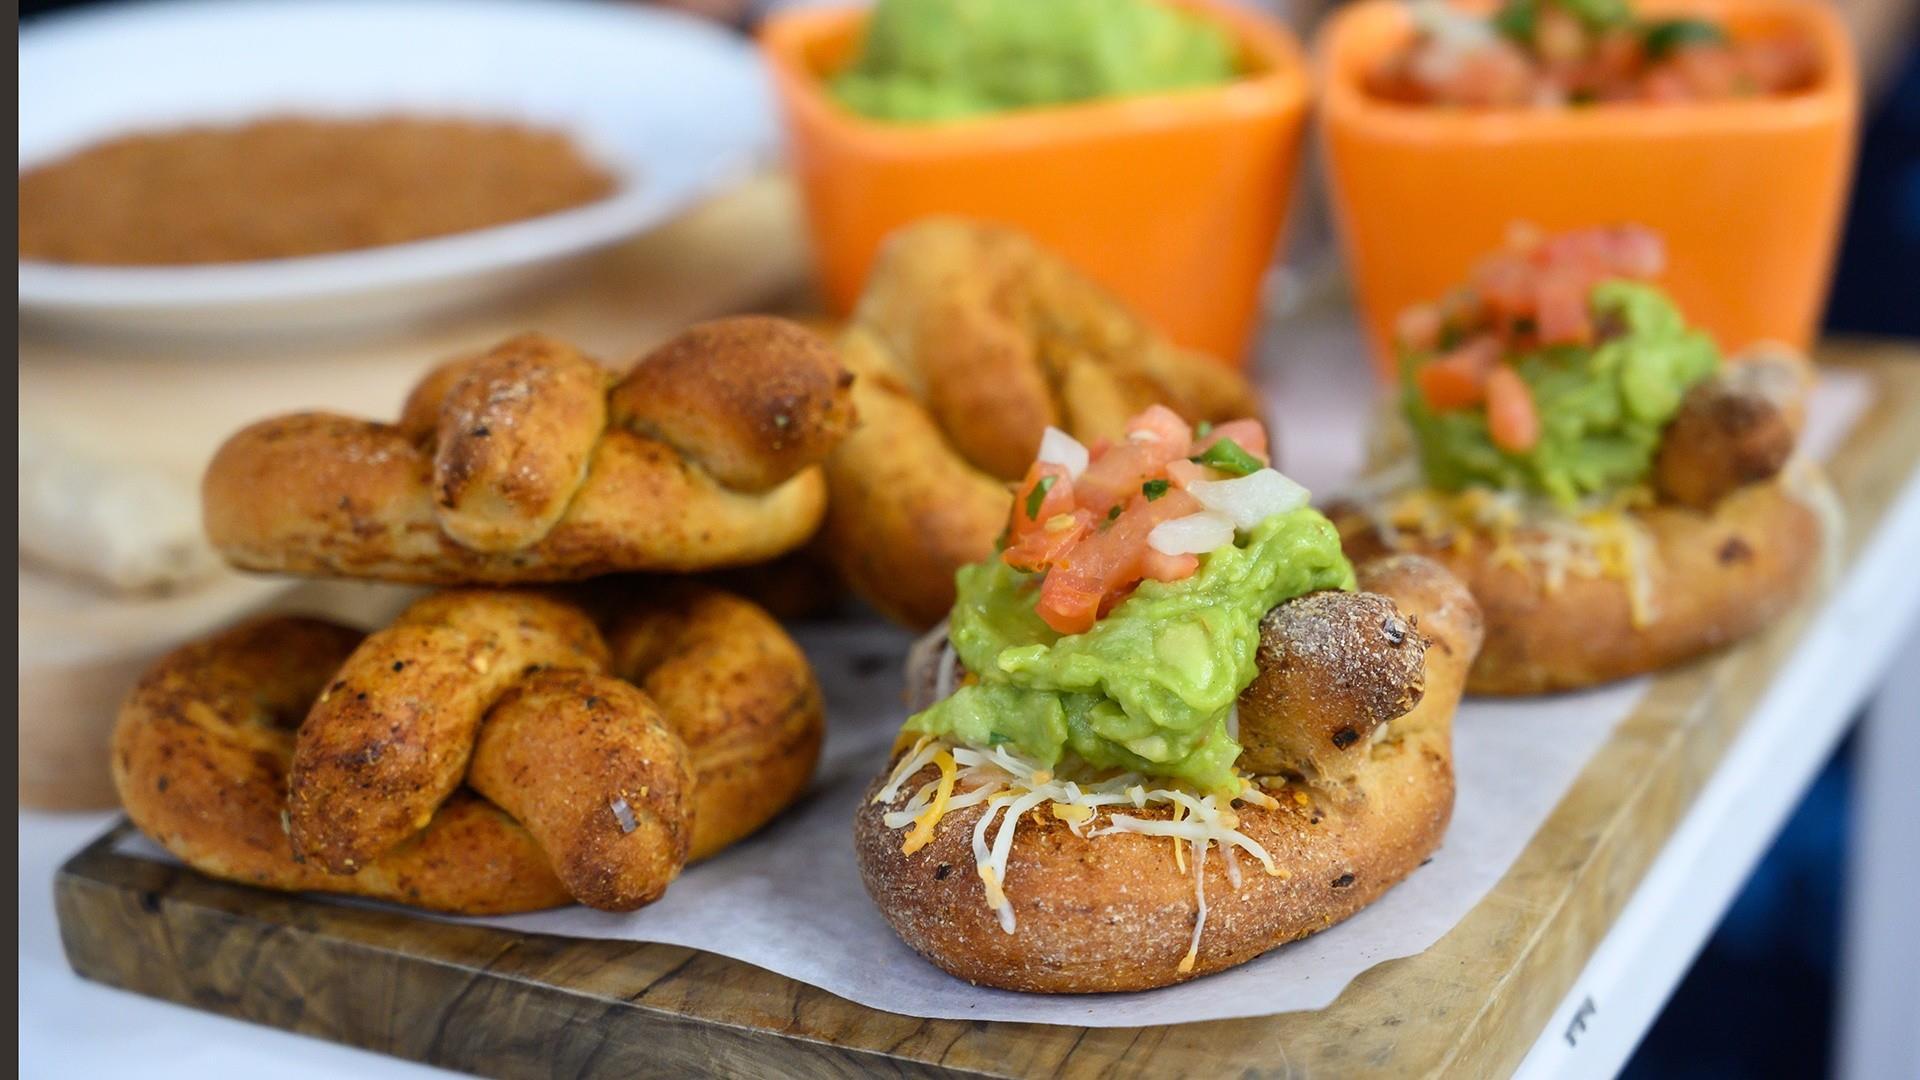 Healthy snack recipes: Make Joy Bauer's soft pretzels and more